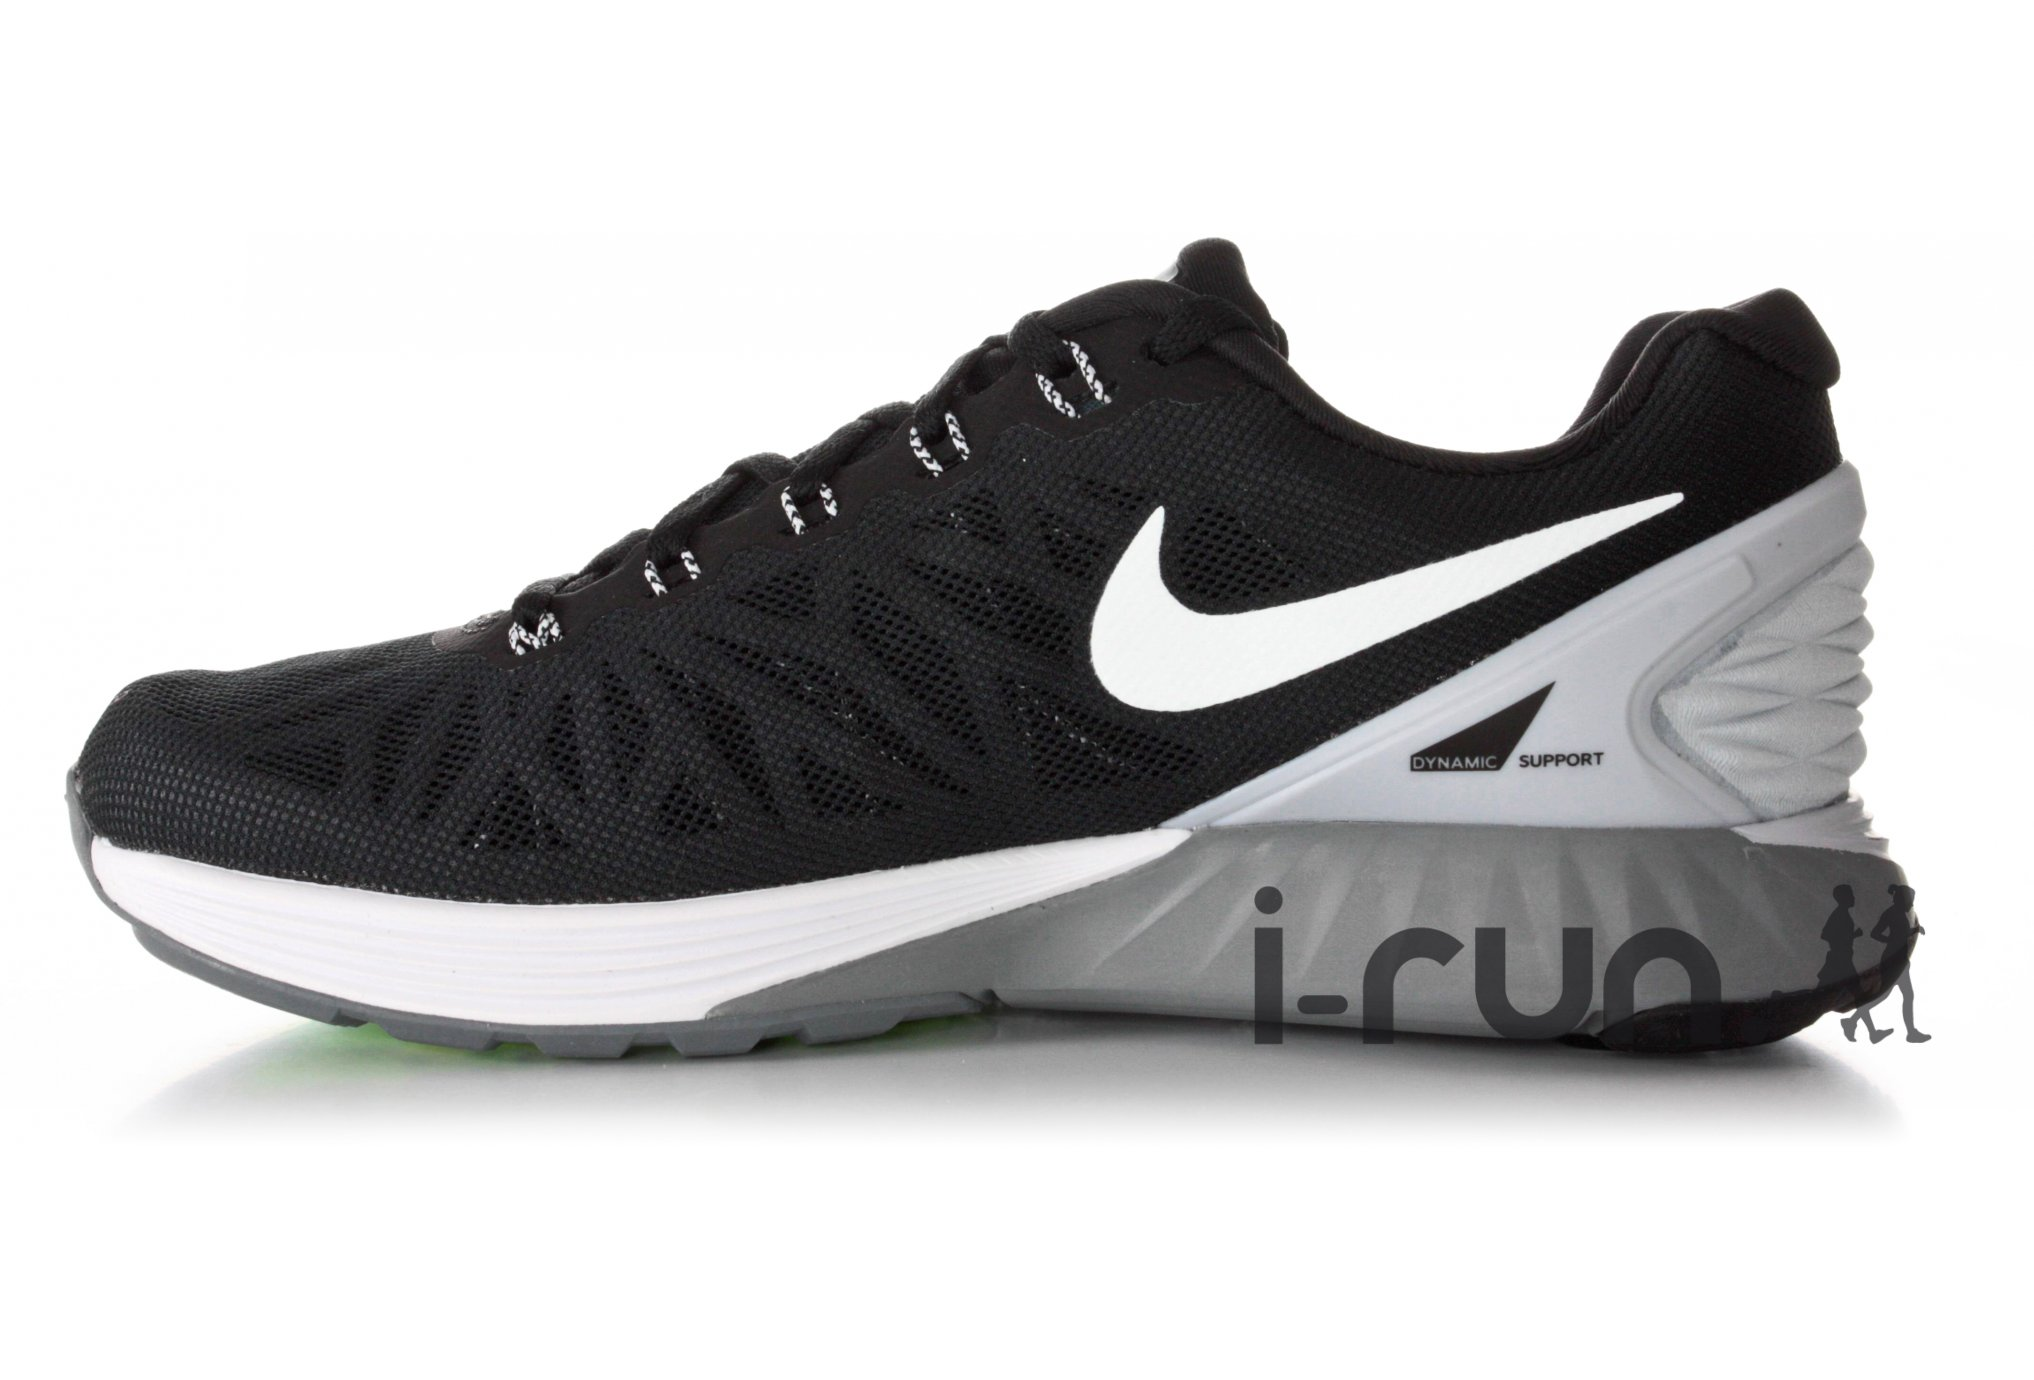 Nike lunarglide 6 w pas cher destockage nike running lunarglide 6 w en promo - Avis destockage fitness ...